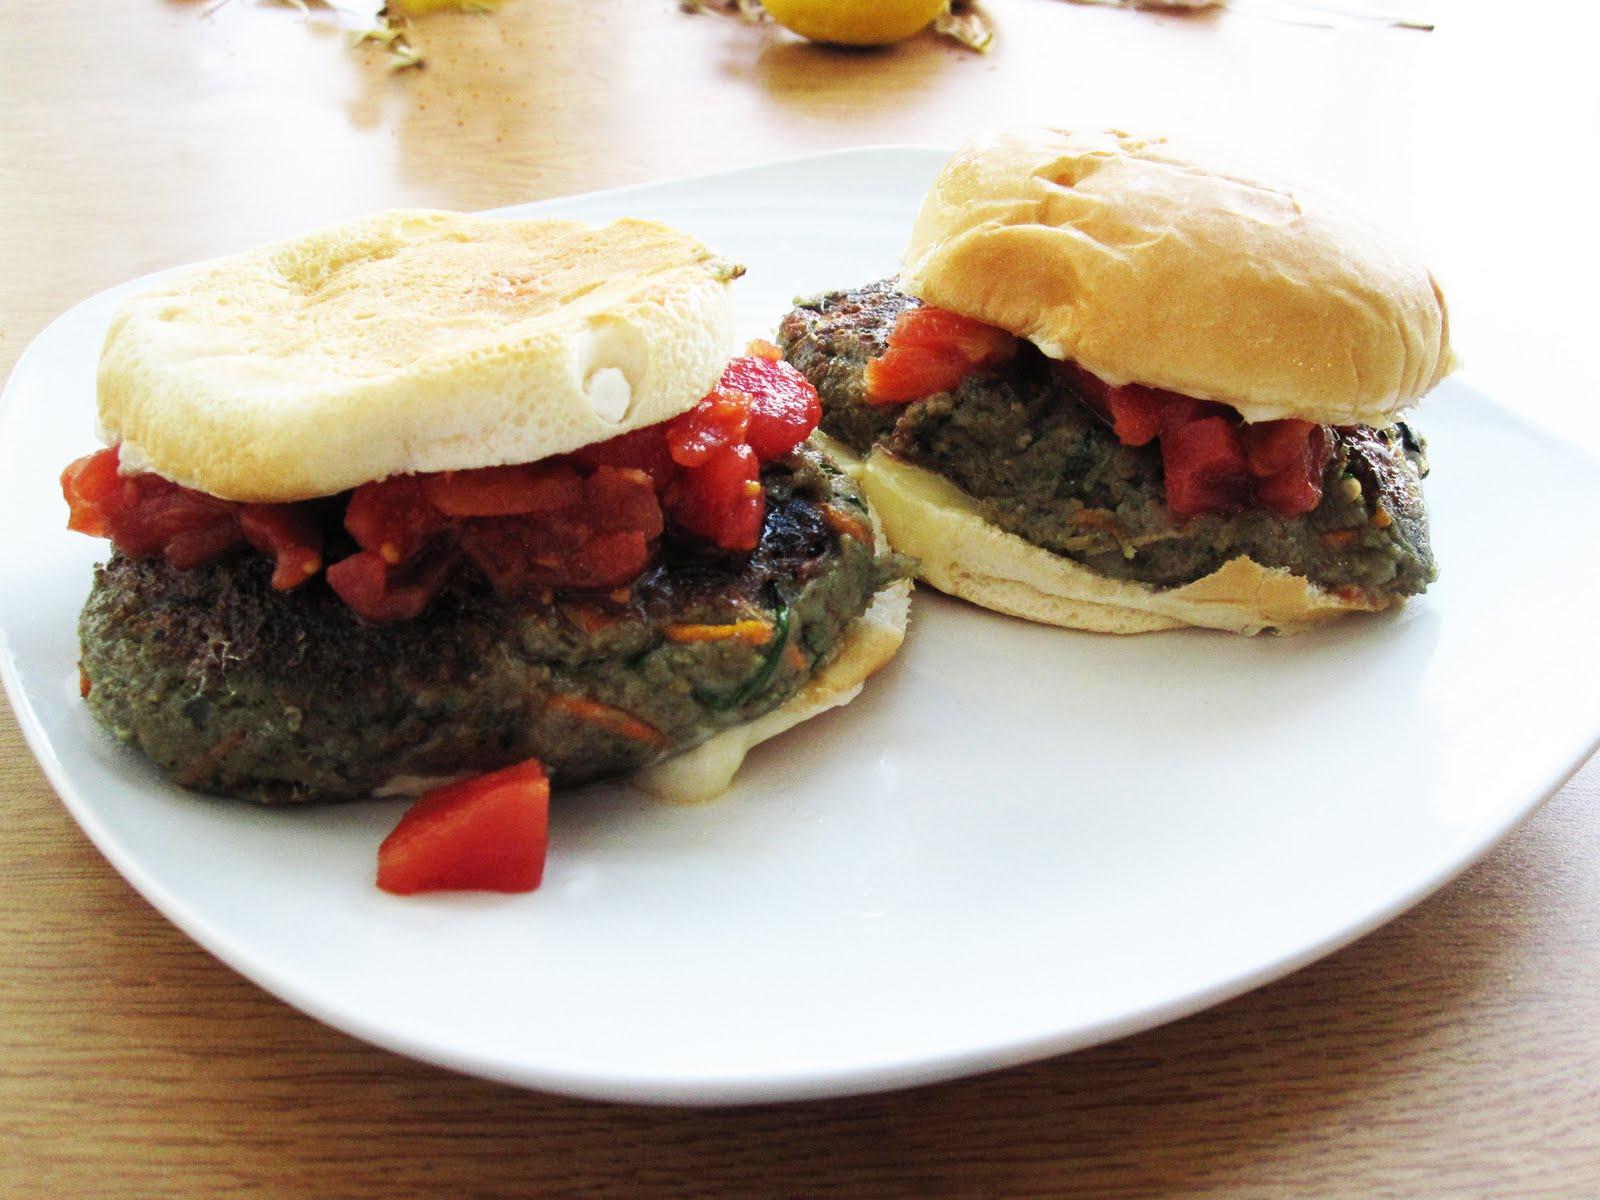 Penn Appétit: Eggplant Burgers